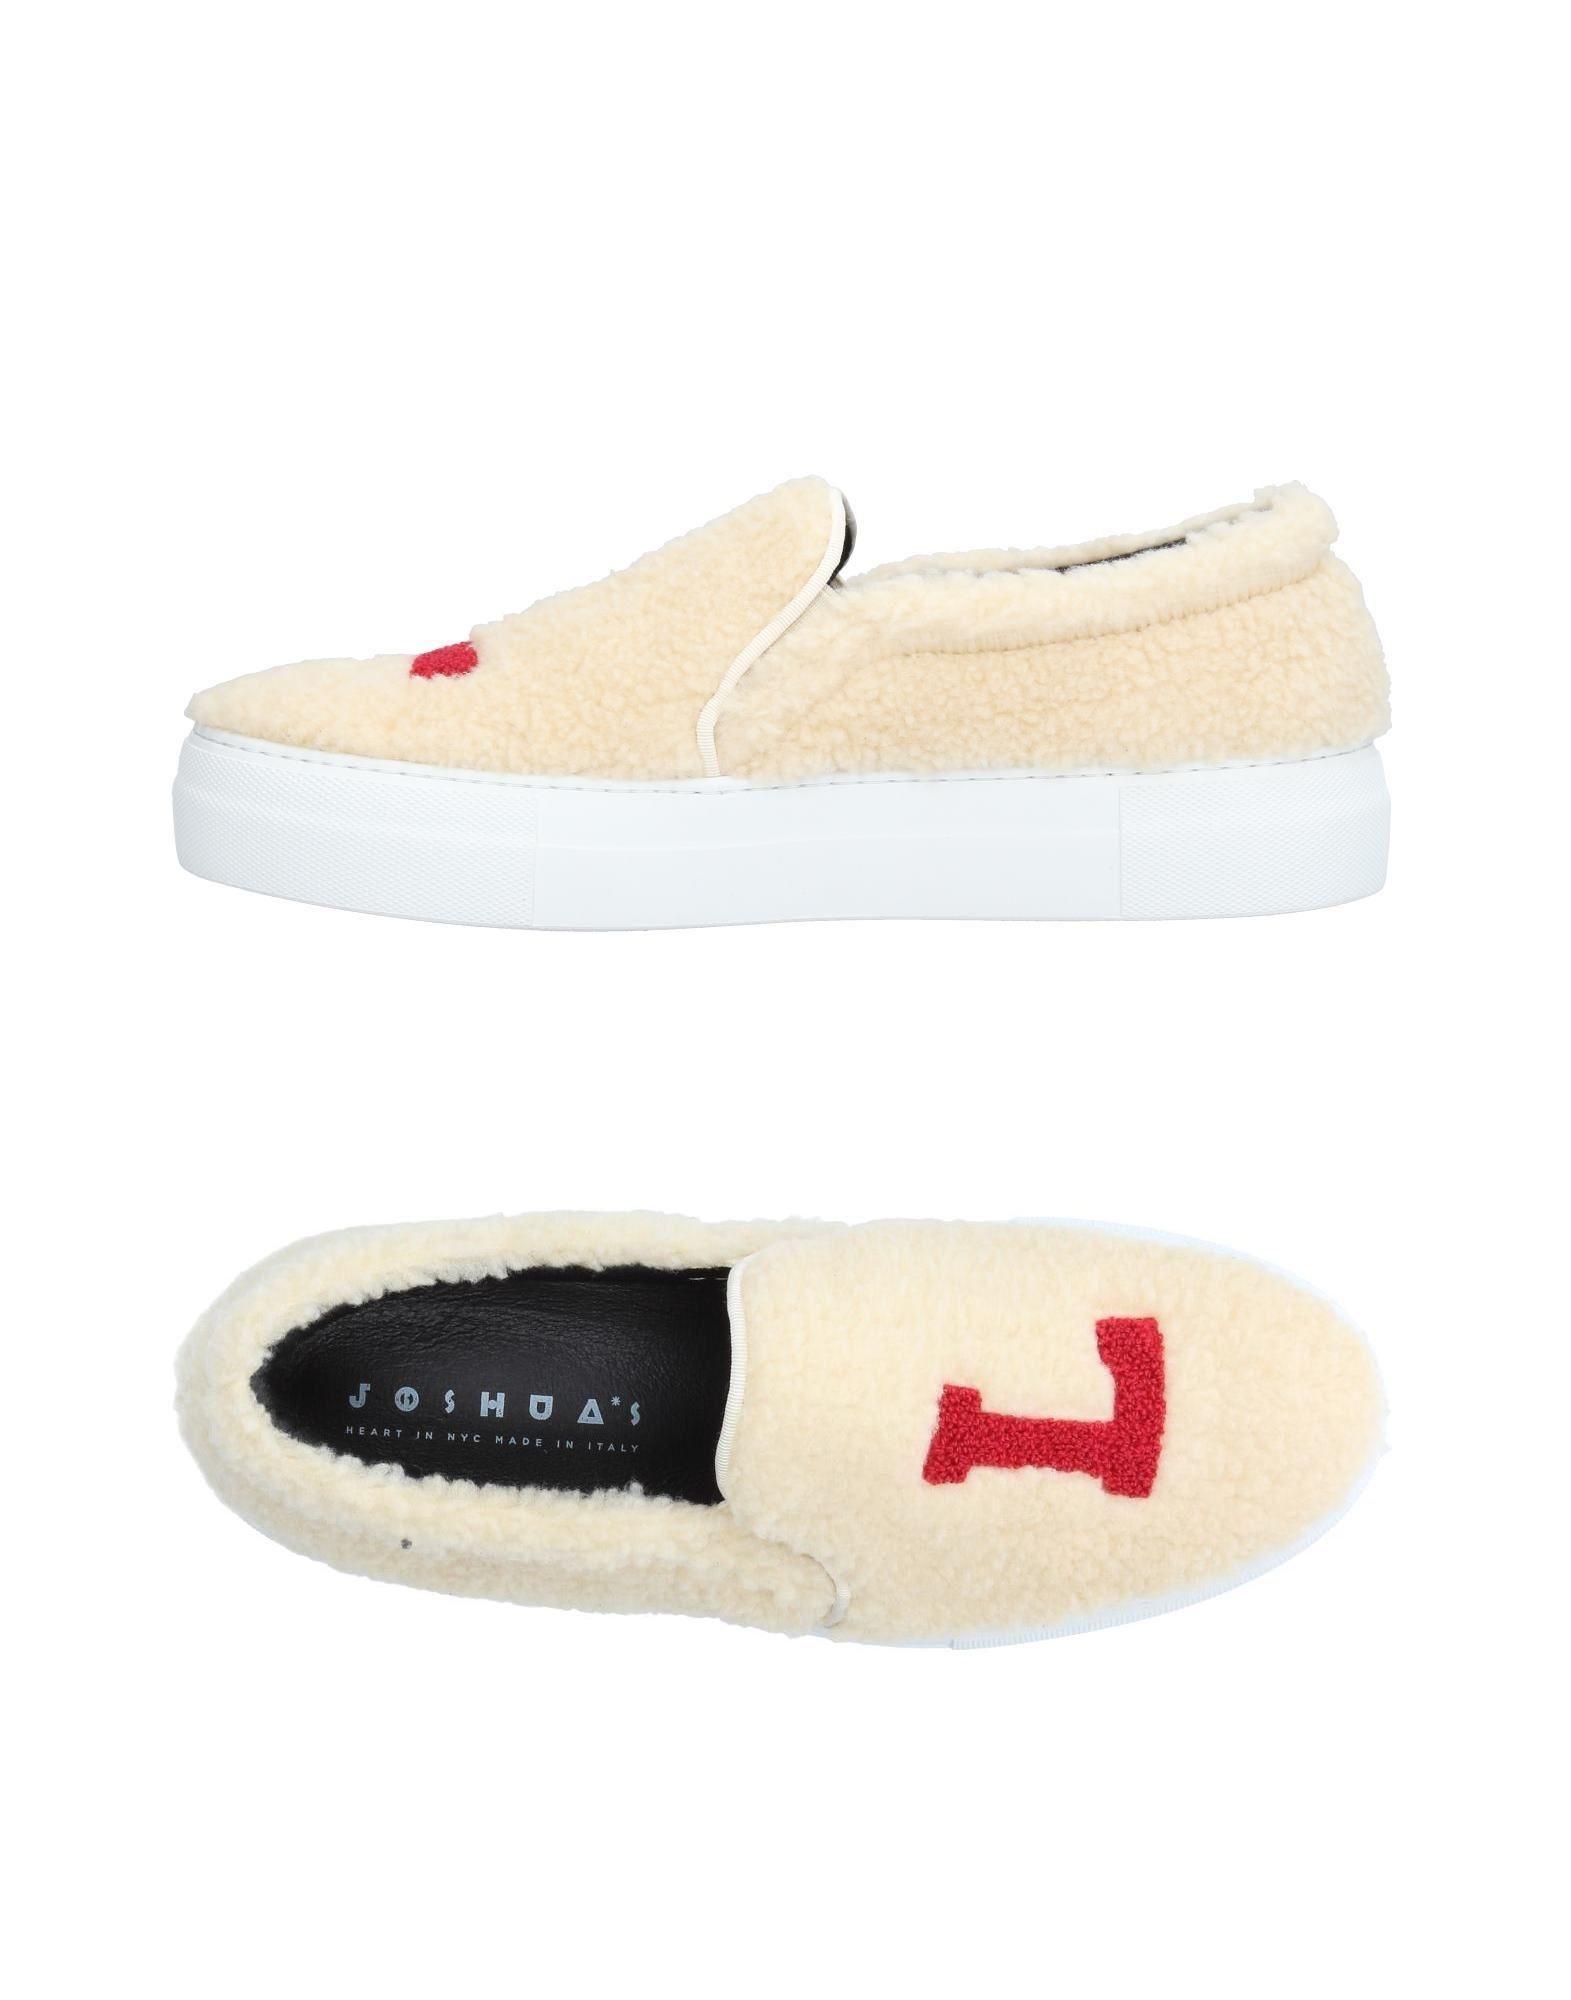 Moda Sneakers Joshua*S Joshua*S Sneakers Donna - 11211698BB 48b36c